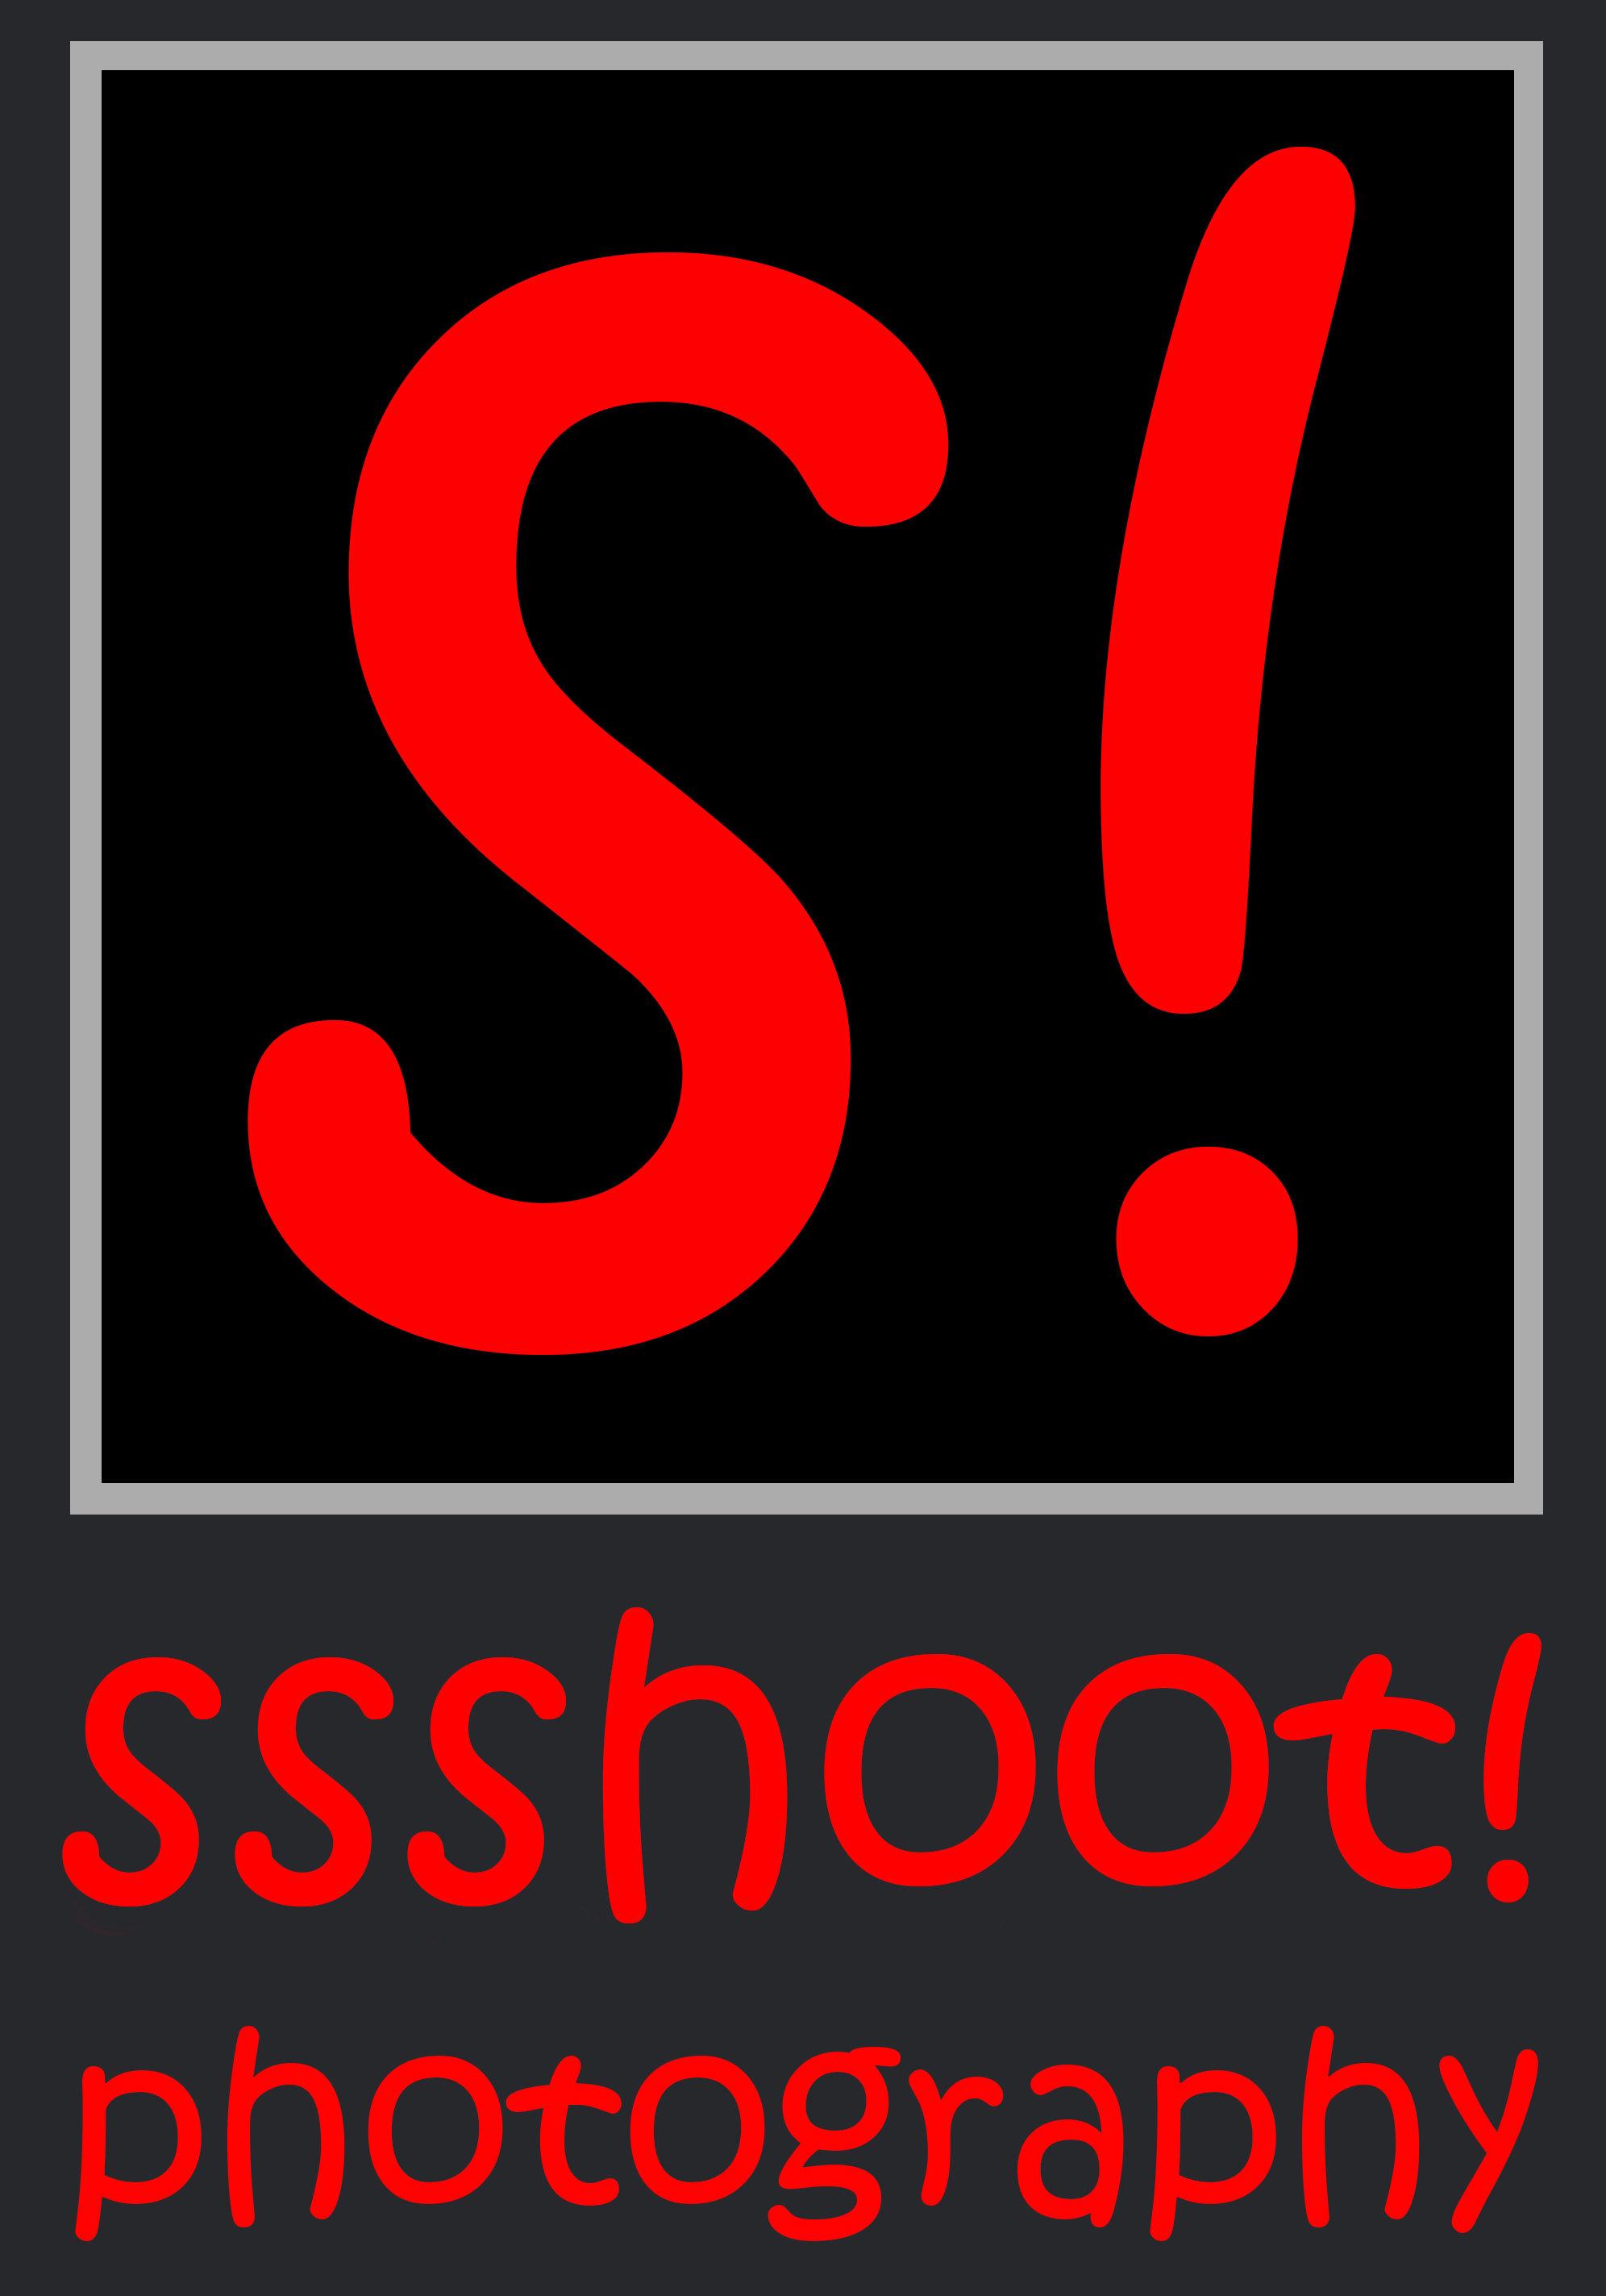 ssshoot! photography